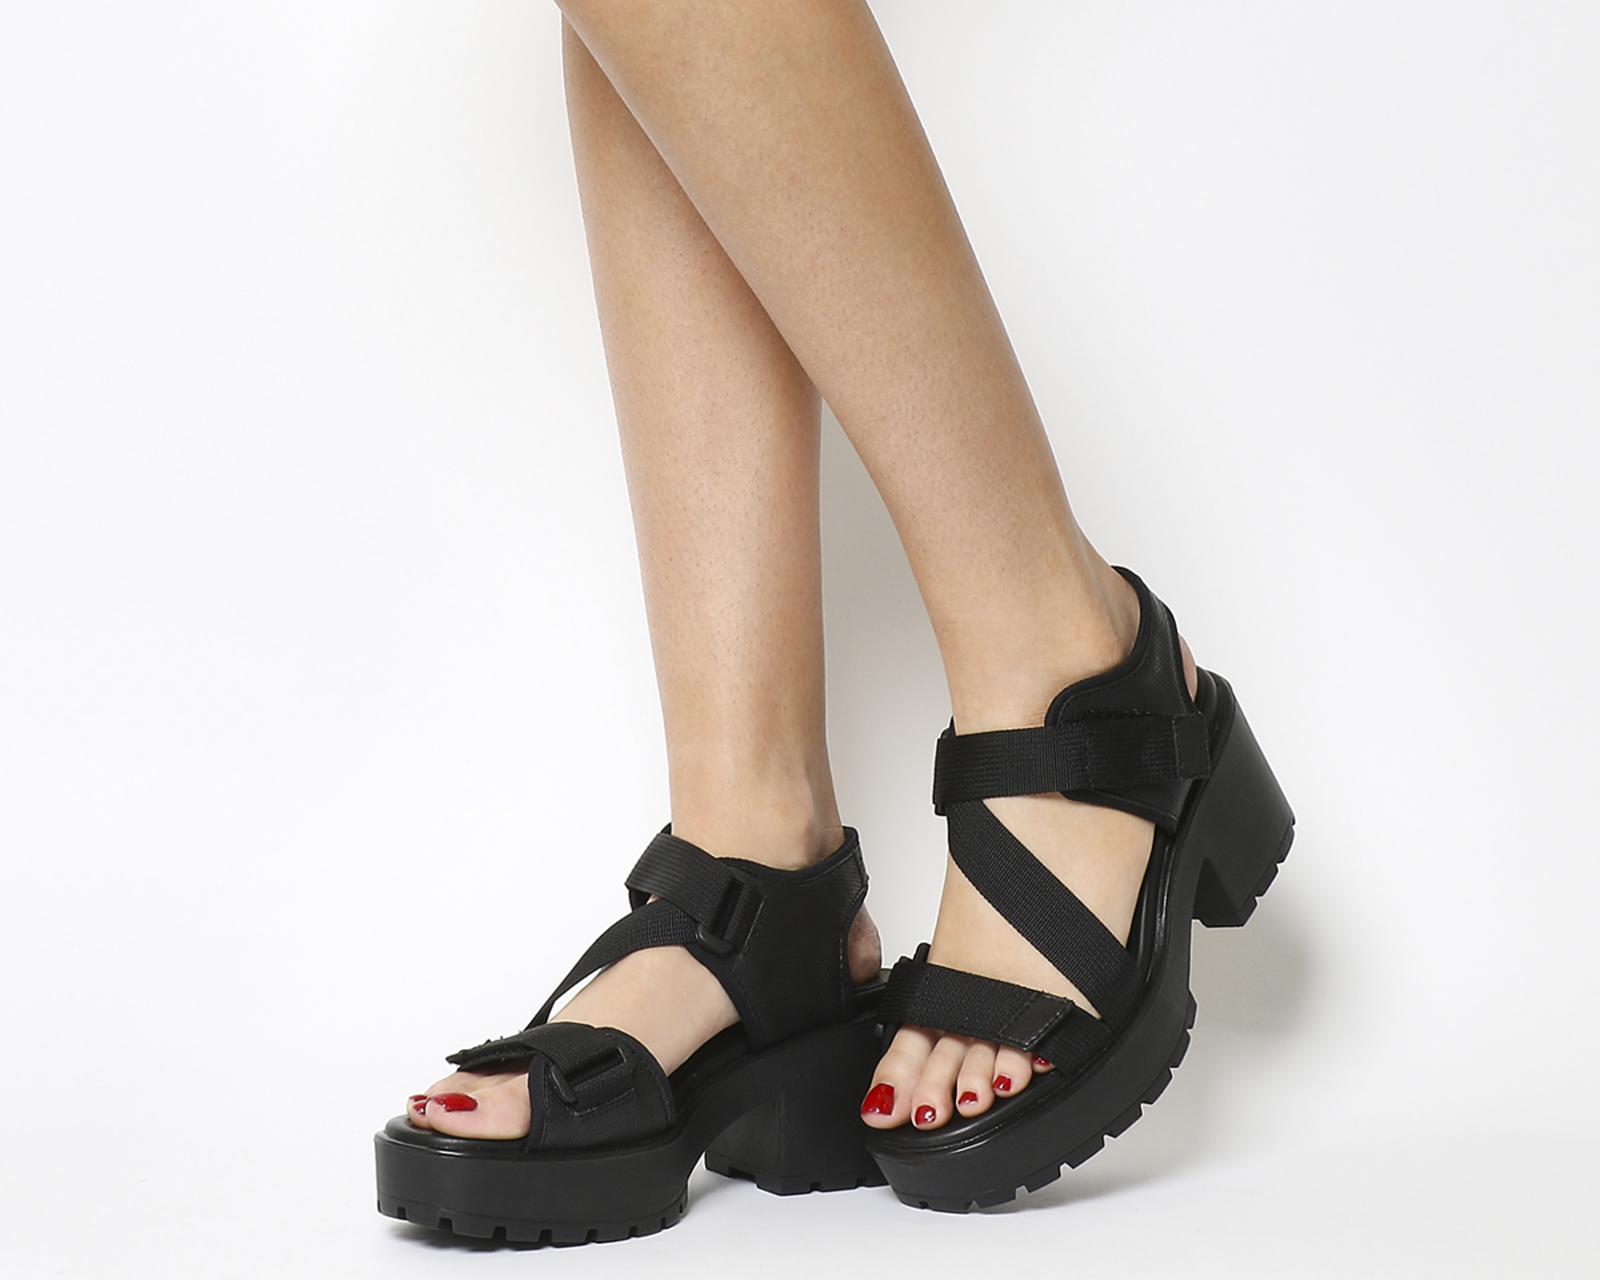 c2c21b404bb Vagabond Black Dioon Sandal